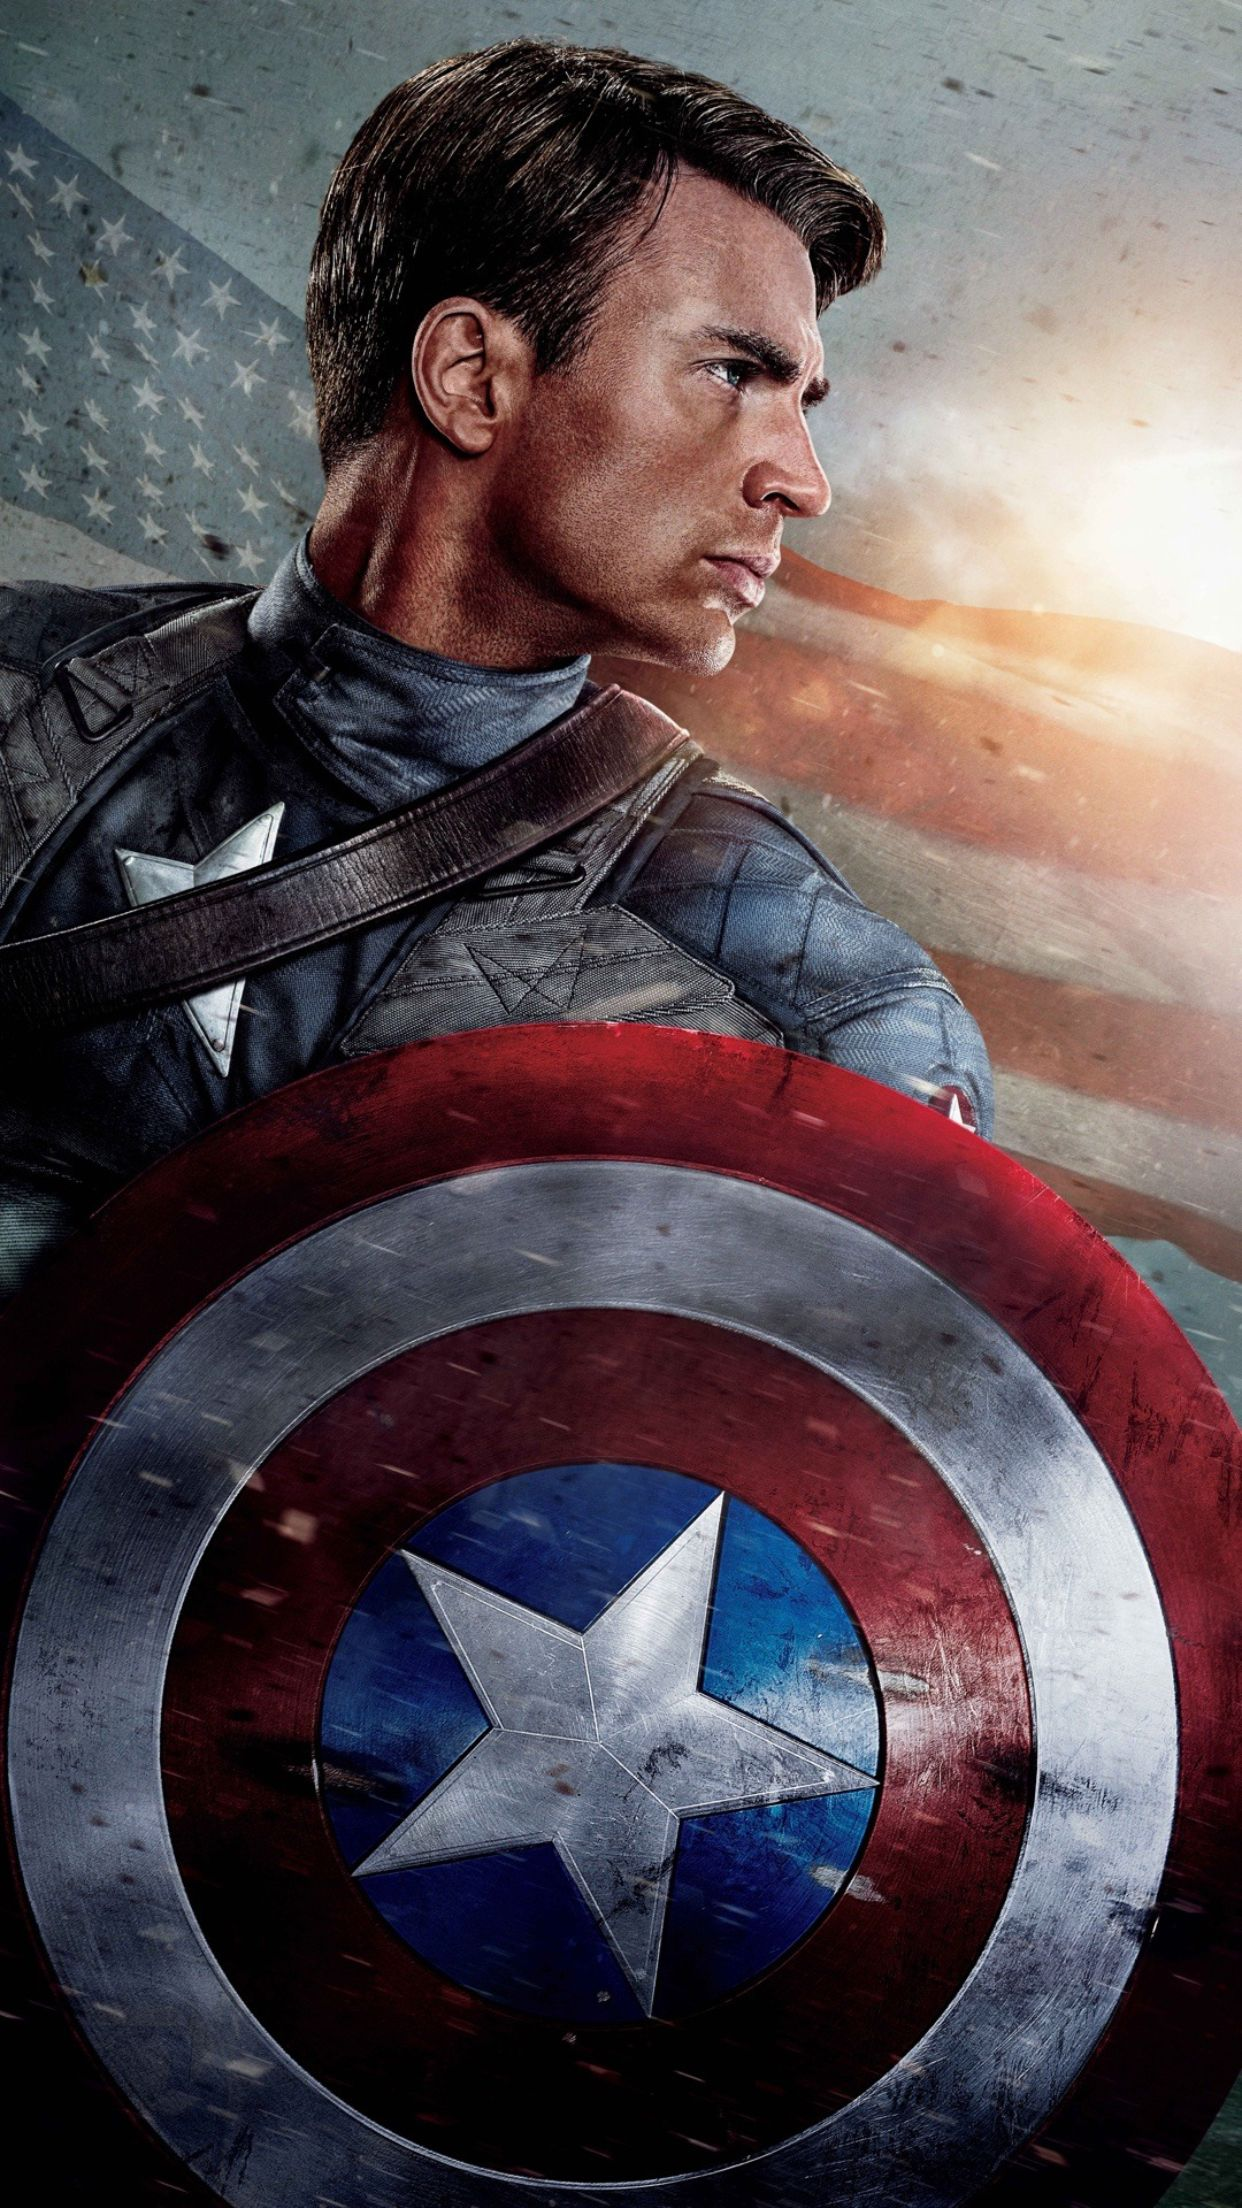 CHRIS EVANS #20,8x10 PHOTO,closeup,CAPTAIN AMERICA,the avengers